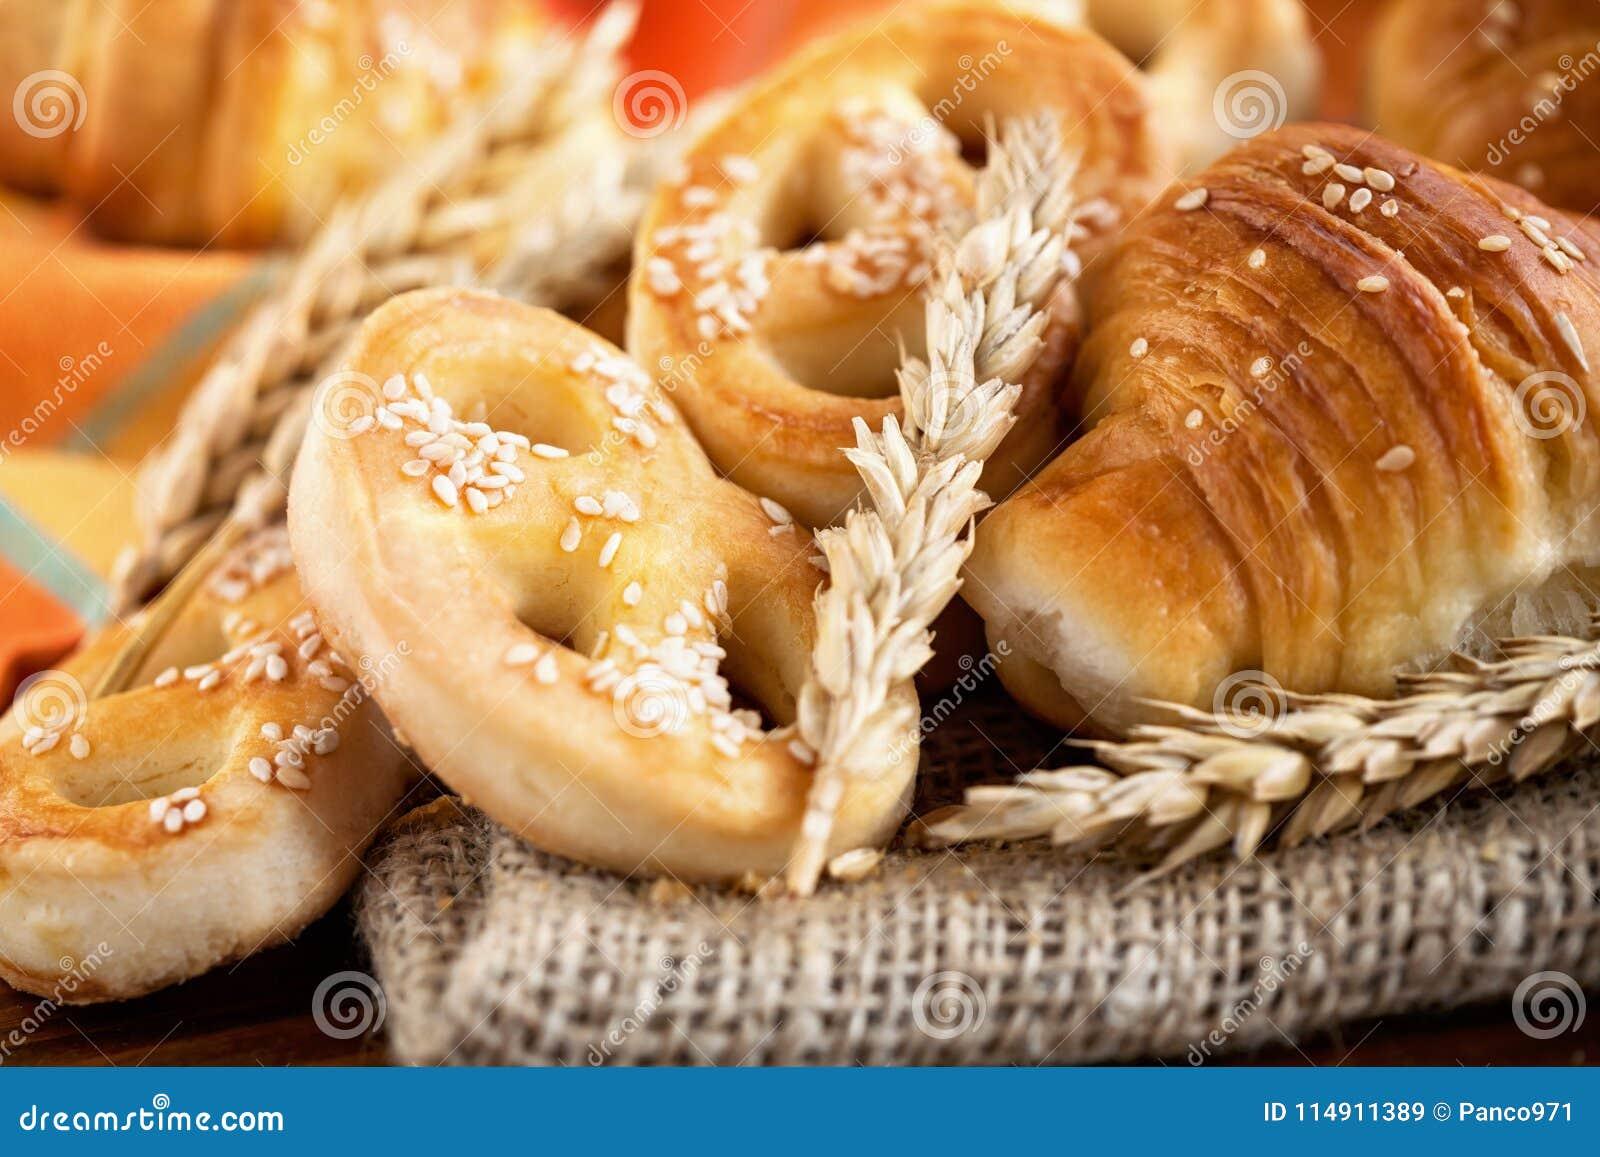 Свежий продукт хлебопекарни